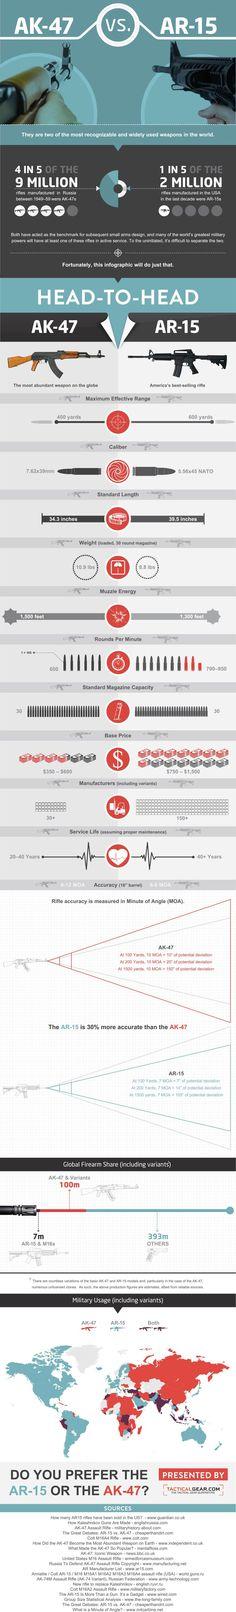 AK-47 vs. AR-15 - Great Infographic